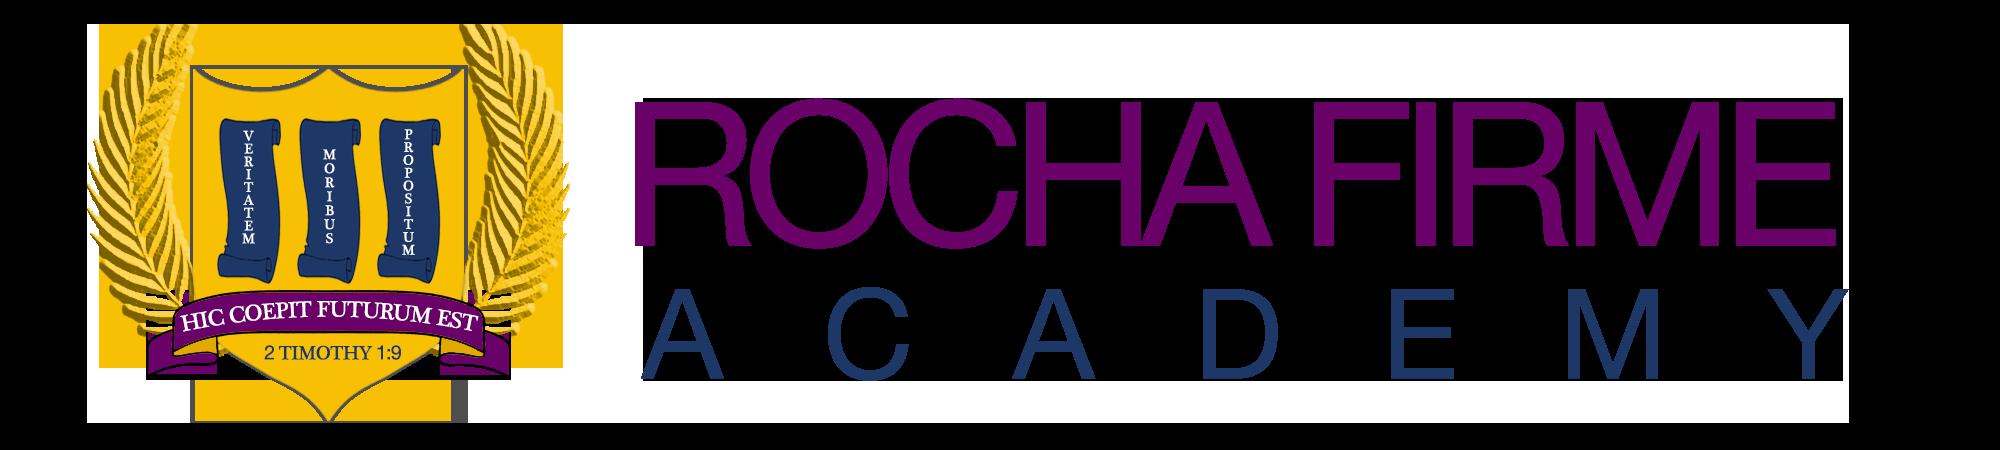 Rocha Firme Academy